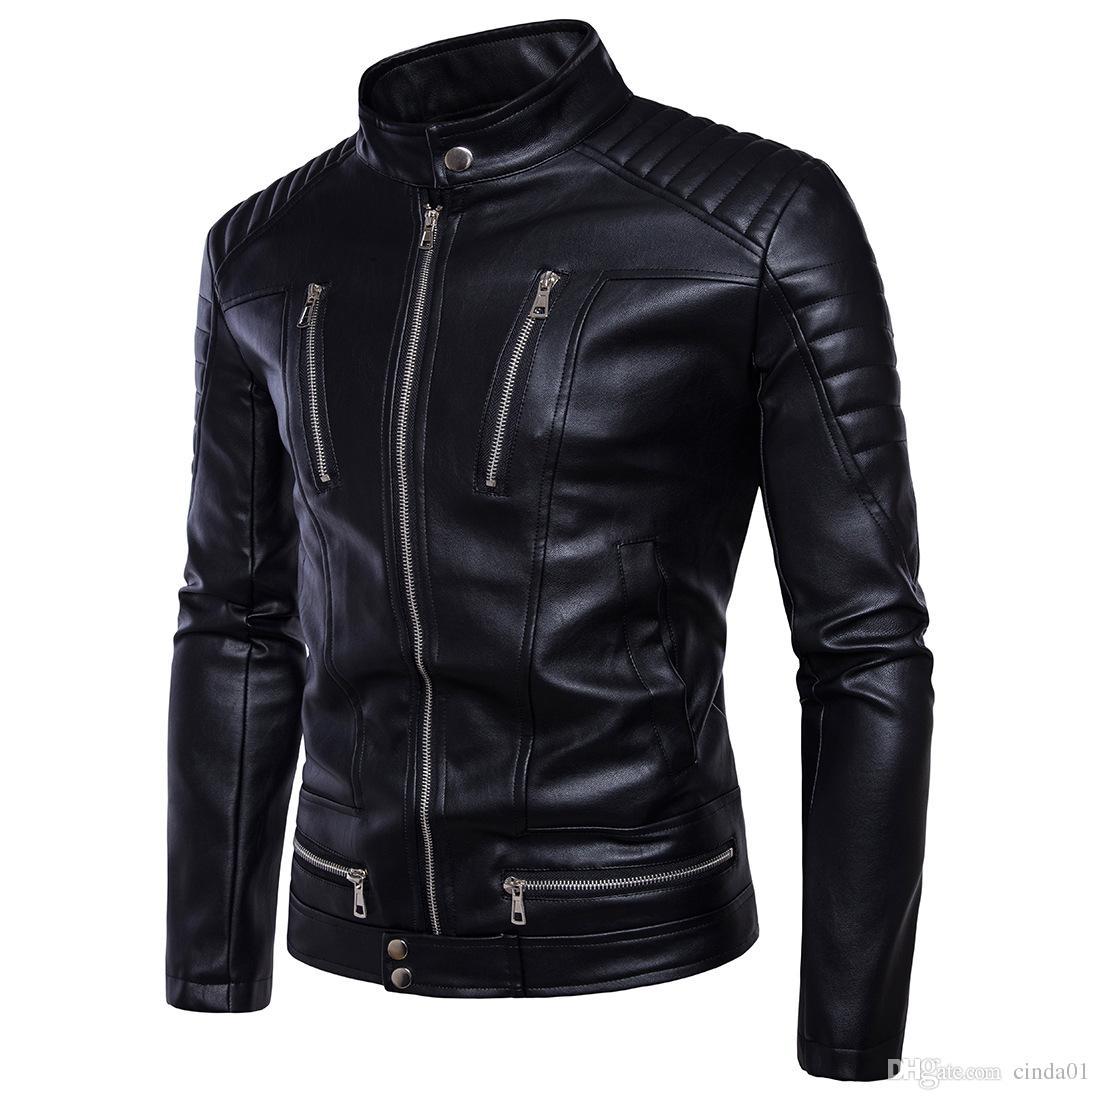 550bb7d20 Mens Faux Leather Jacket PU Leather Biker Streetwear Winter Male Punk Style  Jacket with Zippers Asian Size M-5XL